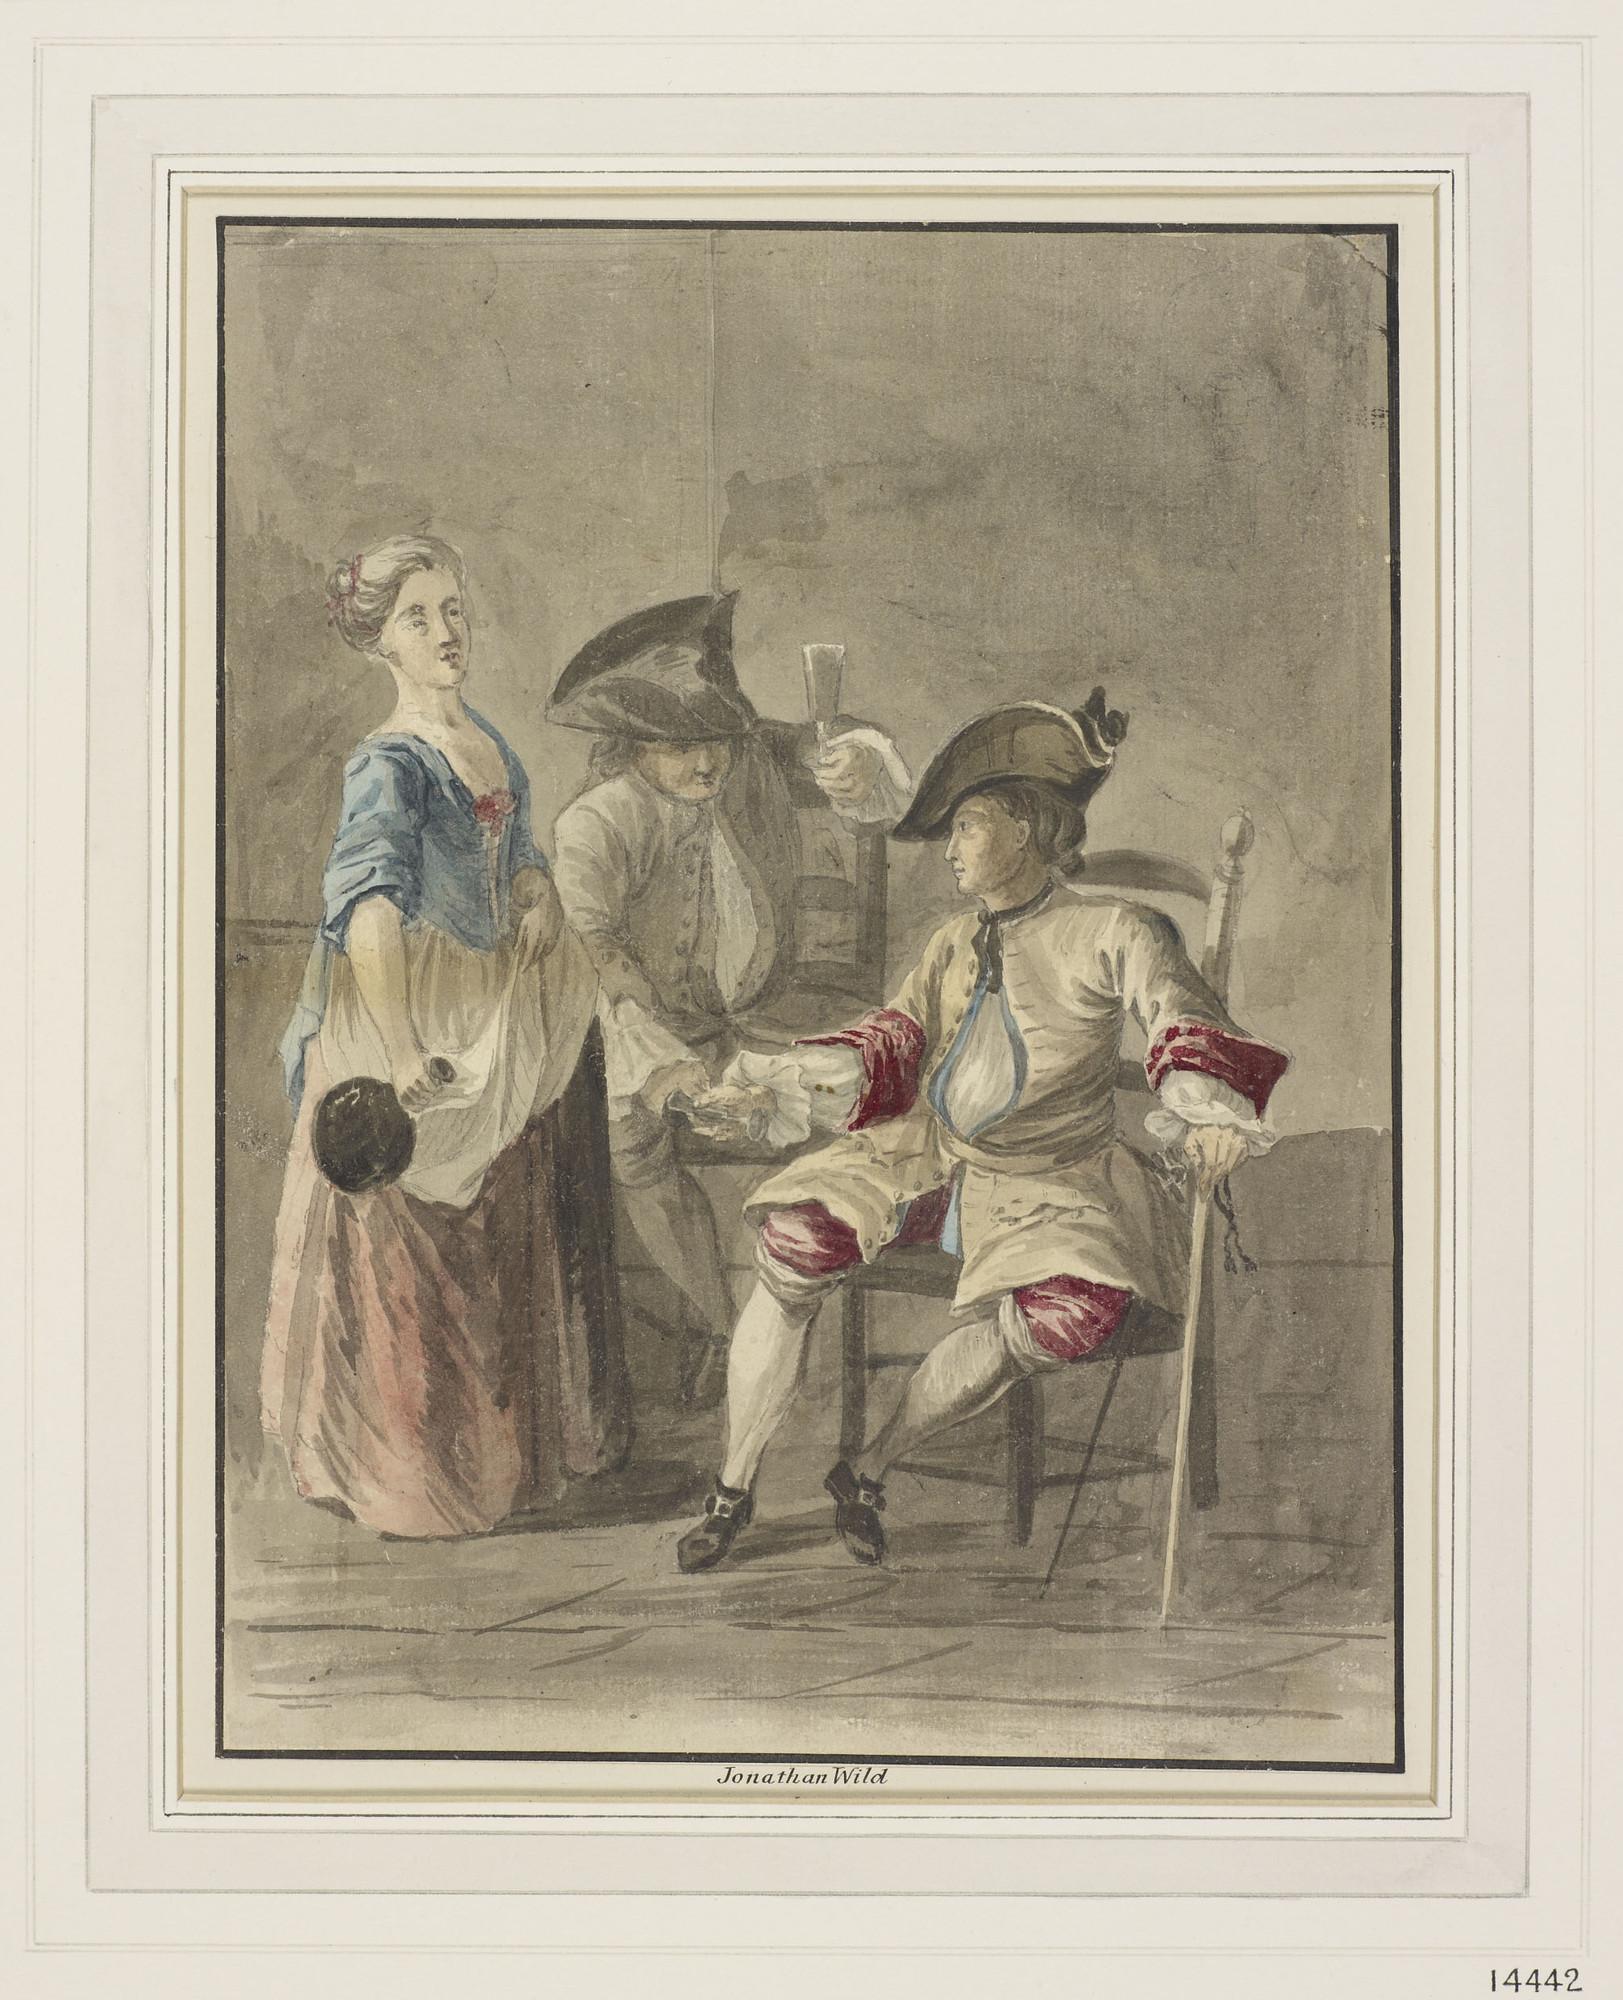 Paul Sandby,Jonathan Wildc. 1770